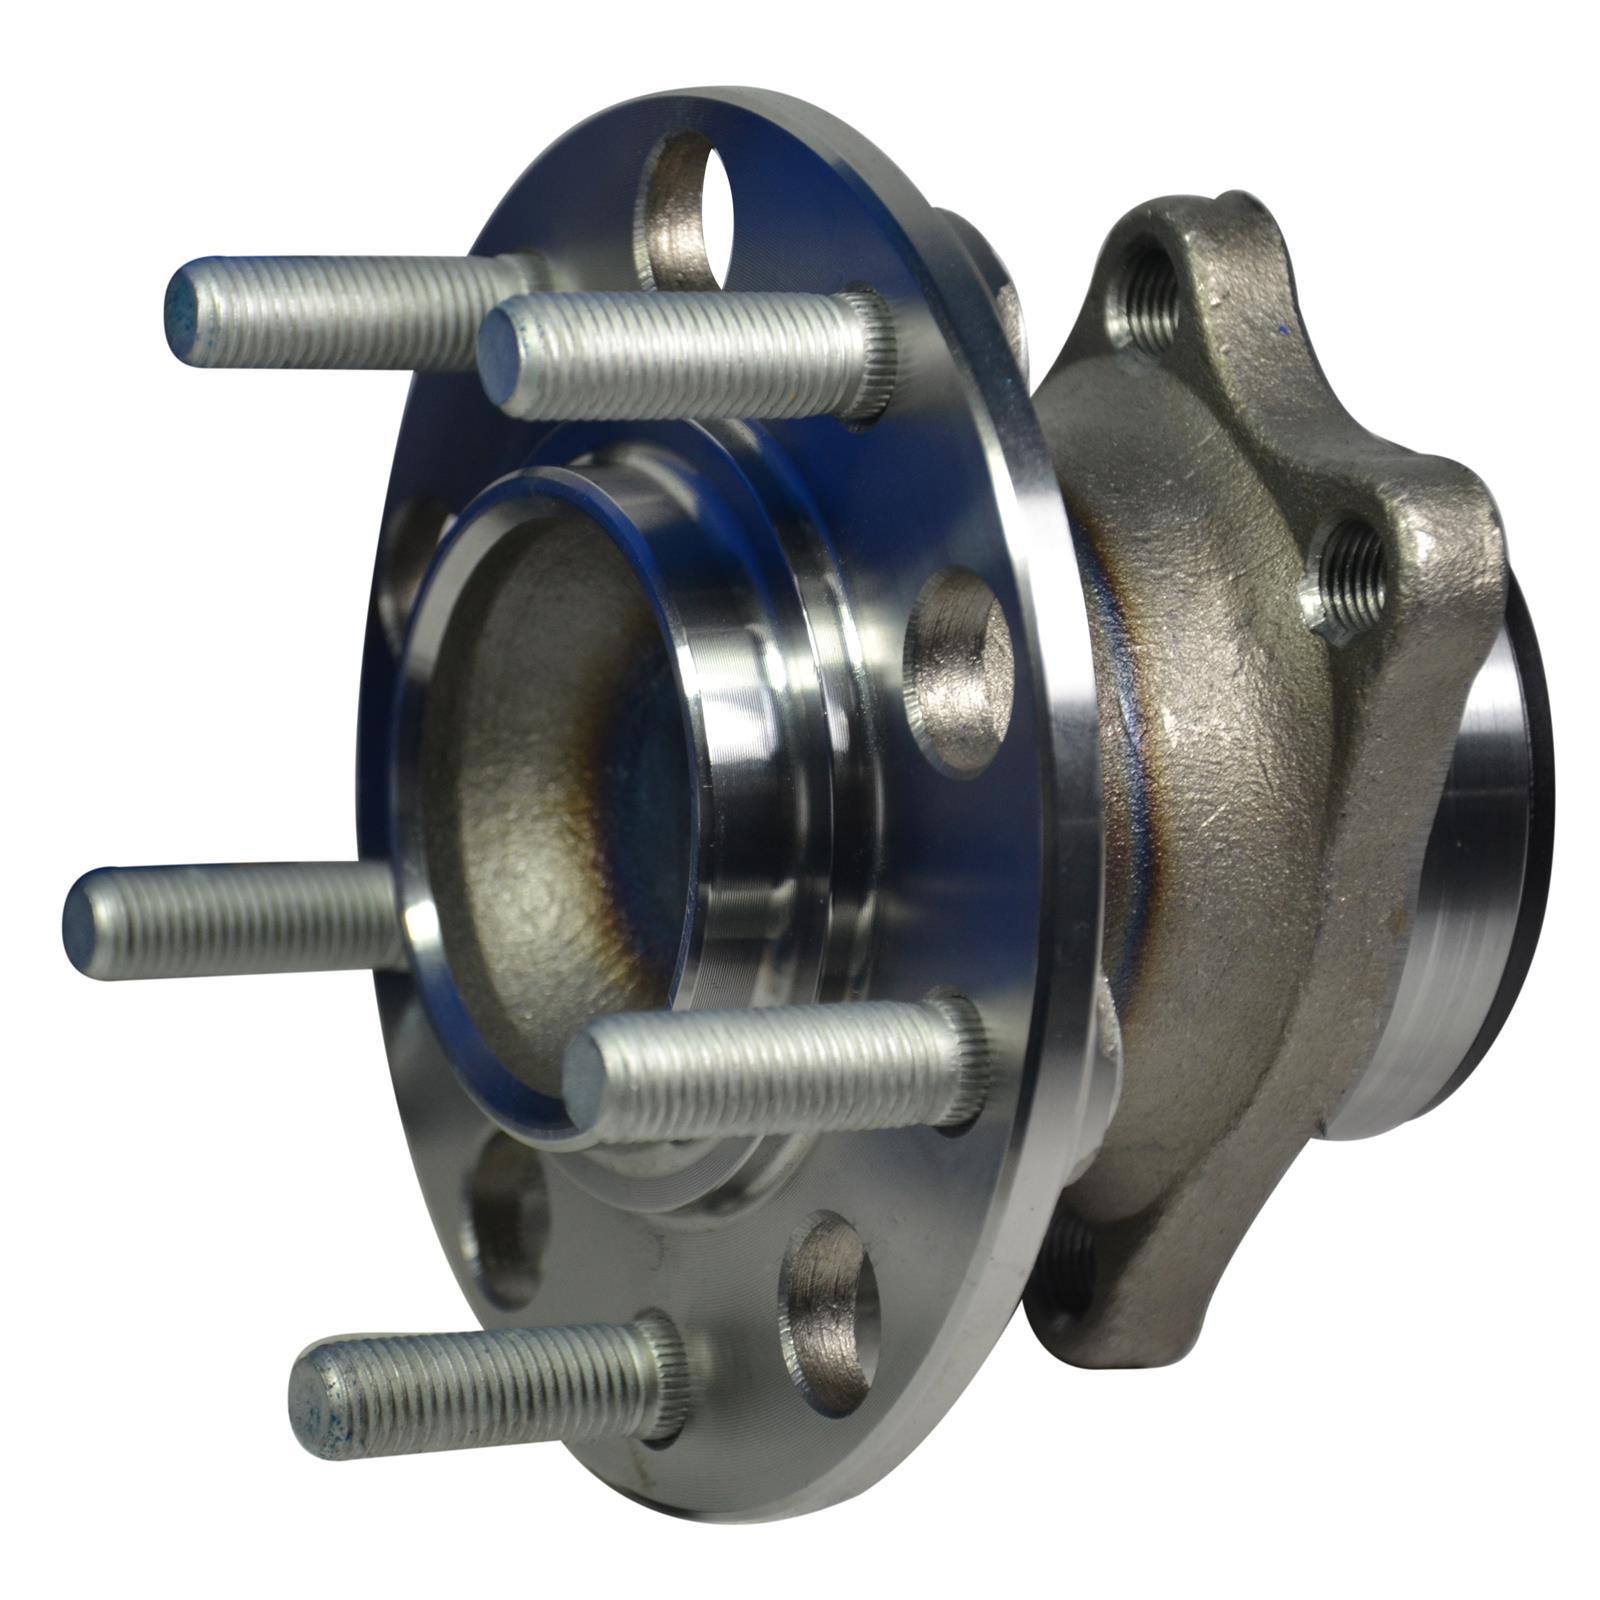 Raybestos 713263 Professional Grade Wheel Hub and Bearing Assembly